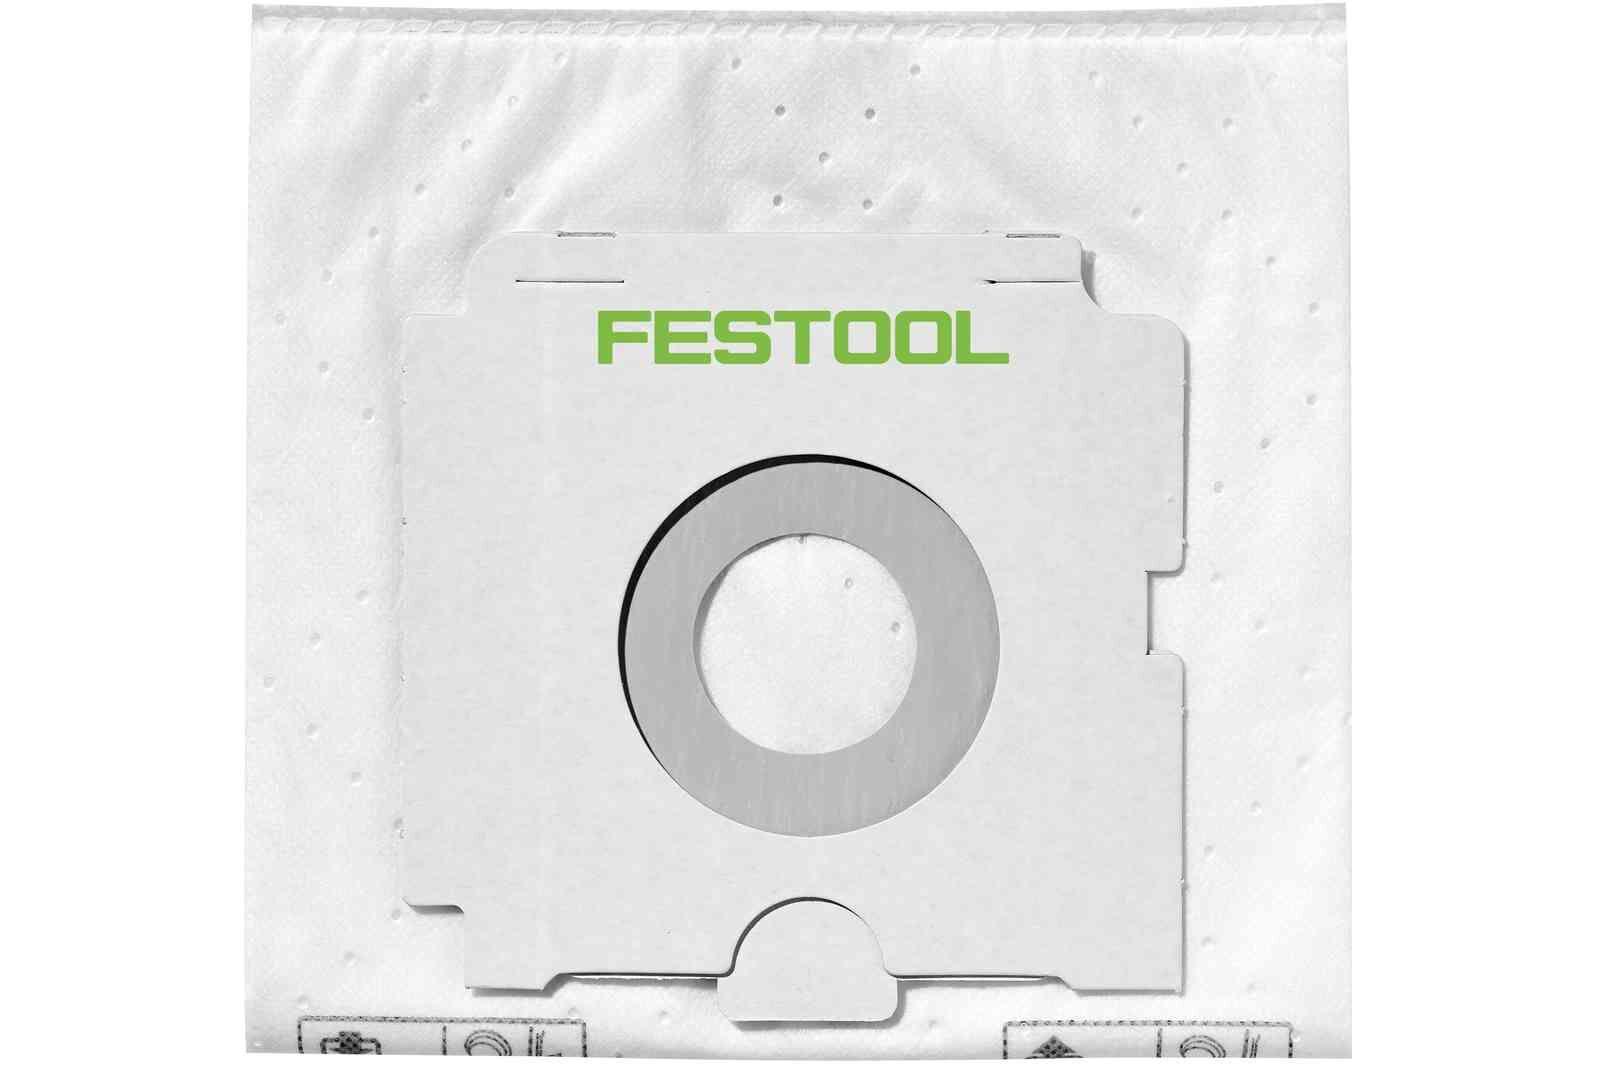 FESTOOL Paquet de 5 sacs filtre SELFCLEAN SC FIS-CT SYS - FESTOOL - 500438